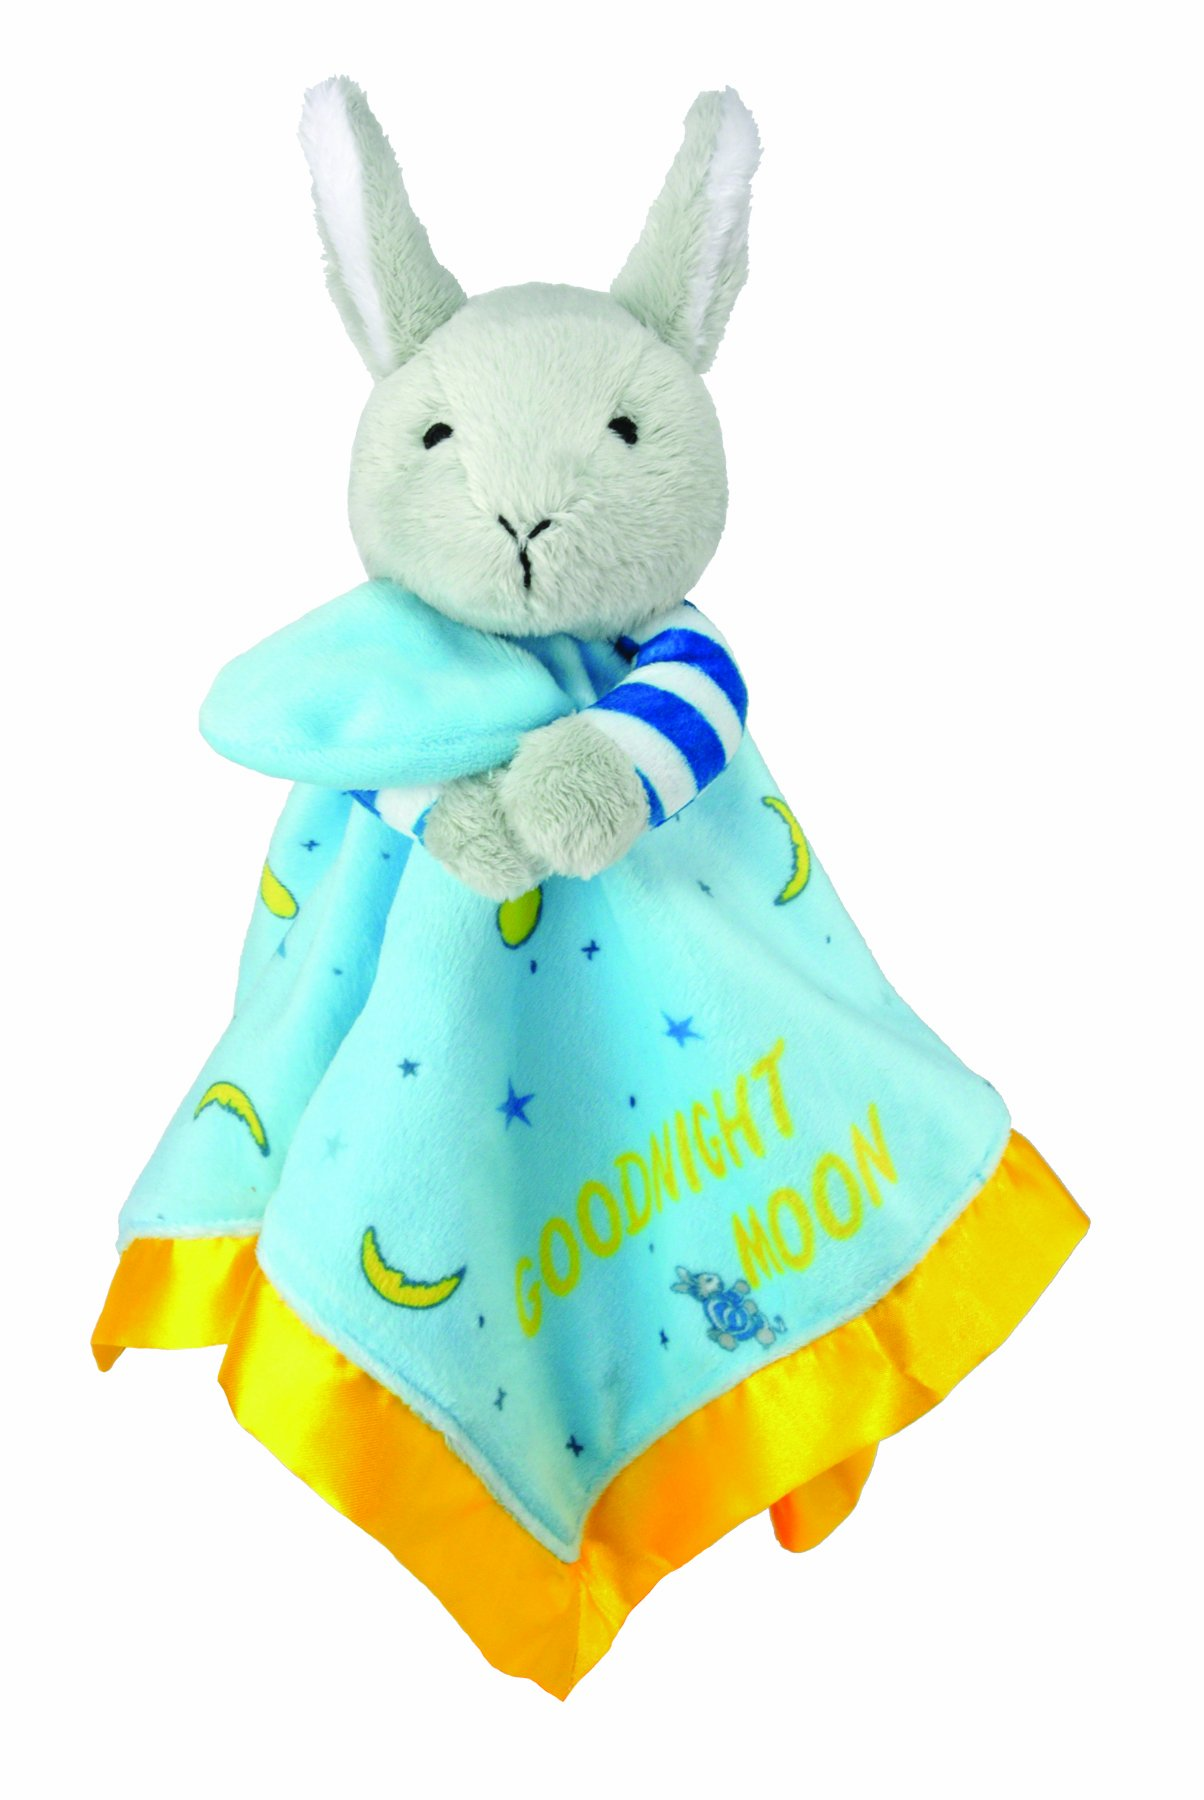 Goodnight Moon Blanky and Rabbit